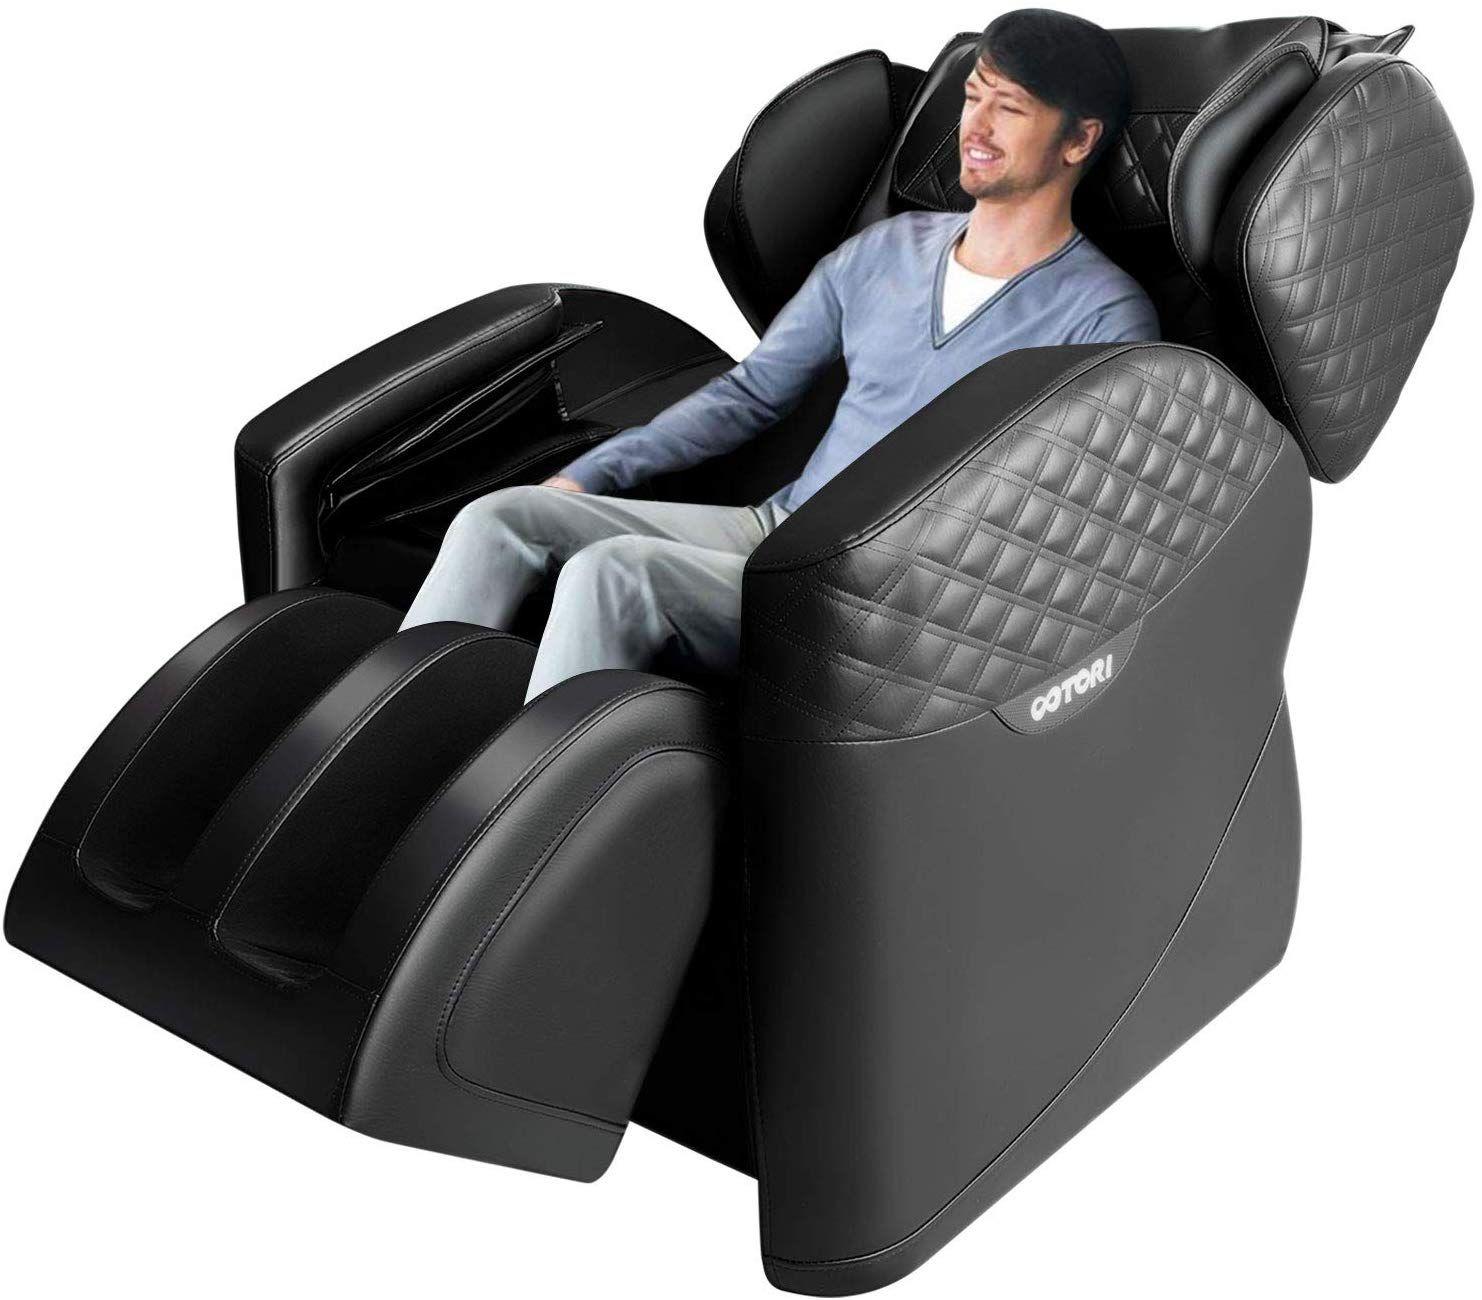 Sinoluck Massage Chair Zero Gravity Full Body Air Massage Lower Back Heating And Foot Roller Massage Chair Feet Roller Massage